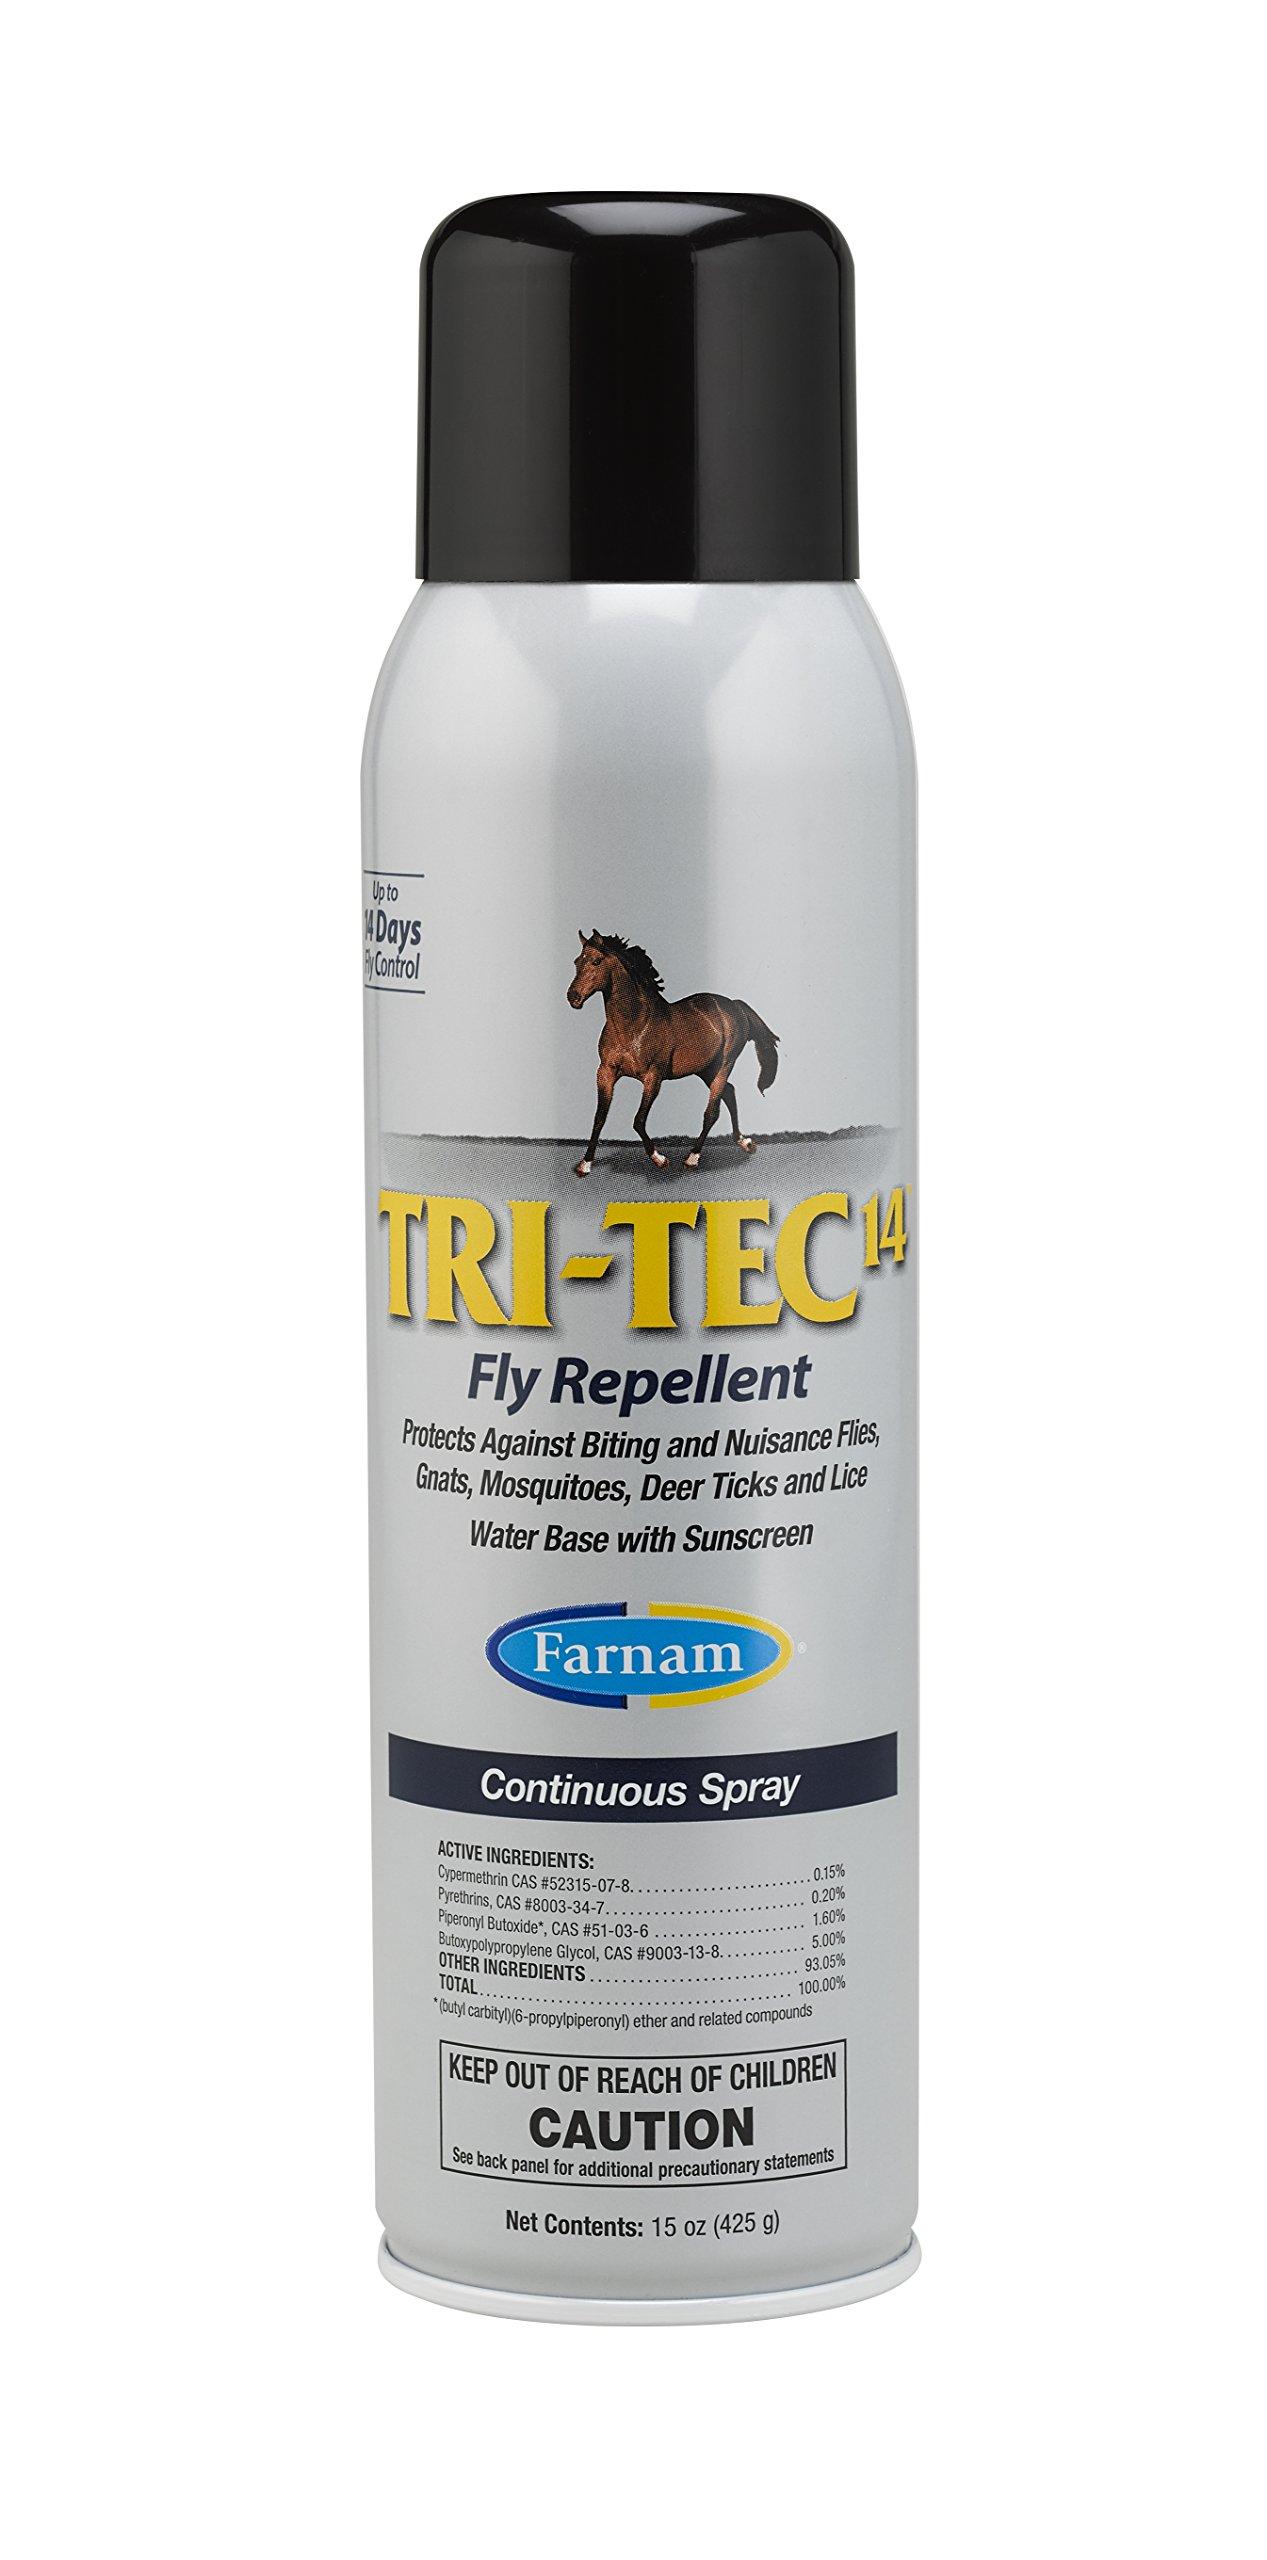 Farnam Tri-Tec 14 Equine Fly Repellent, 15 oz. Continuous Spray